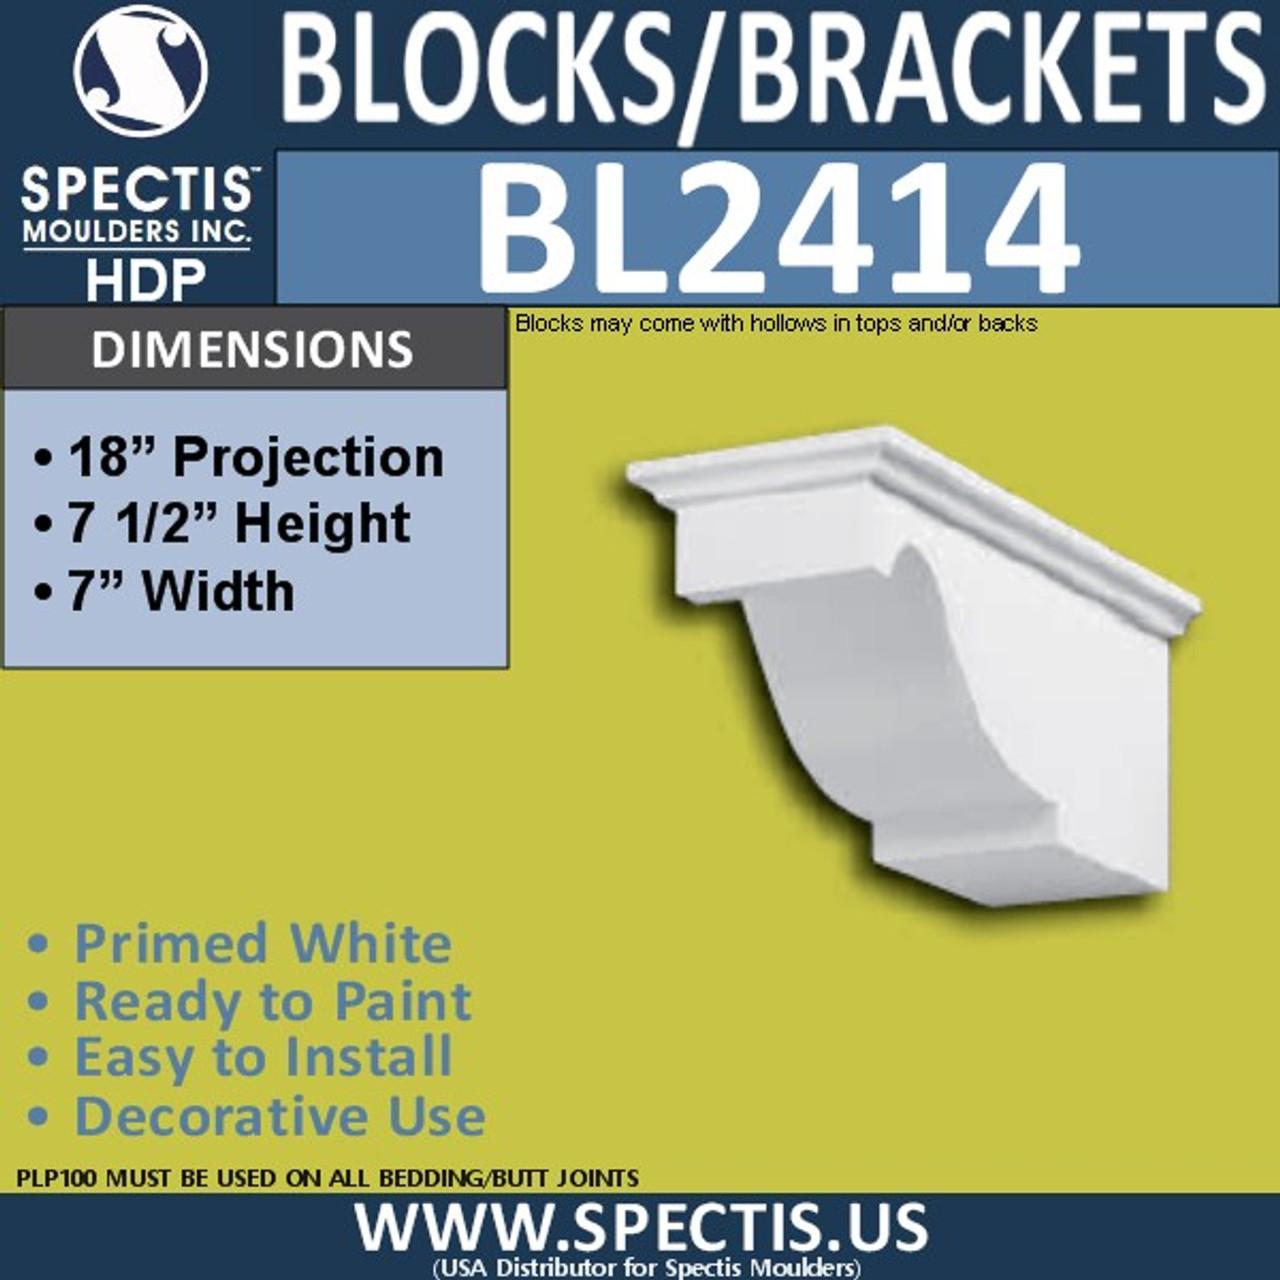 "BL2414 Eave Block or Bracket 7""W x 7.5""H x 18"" P"